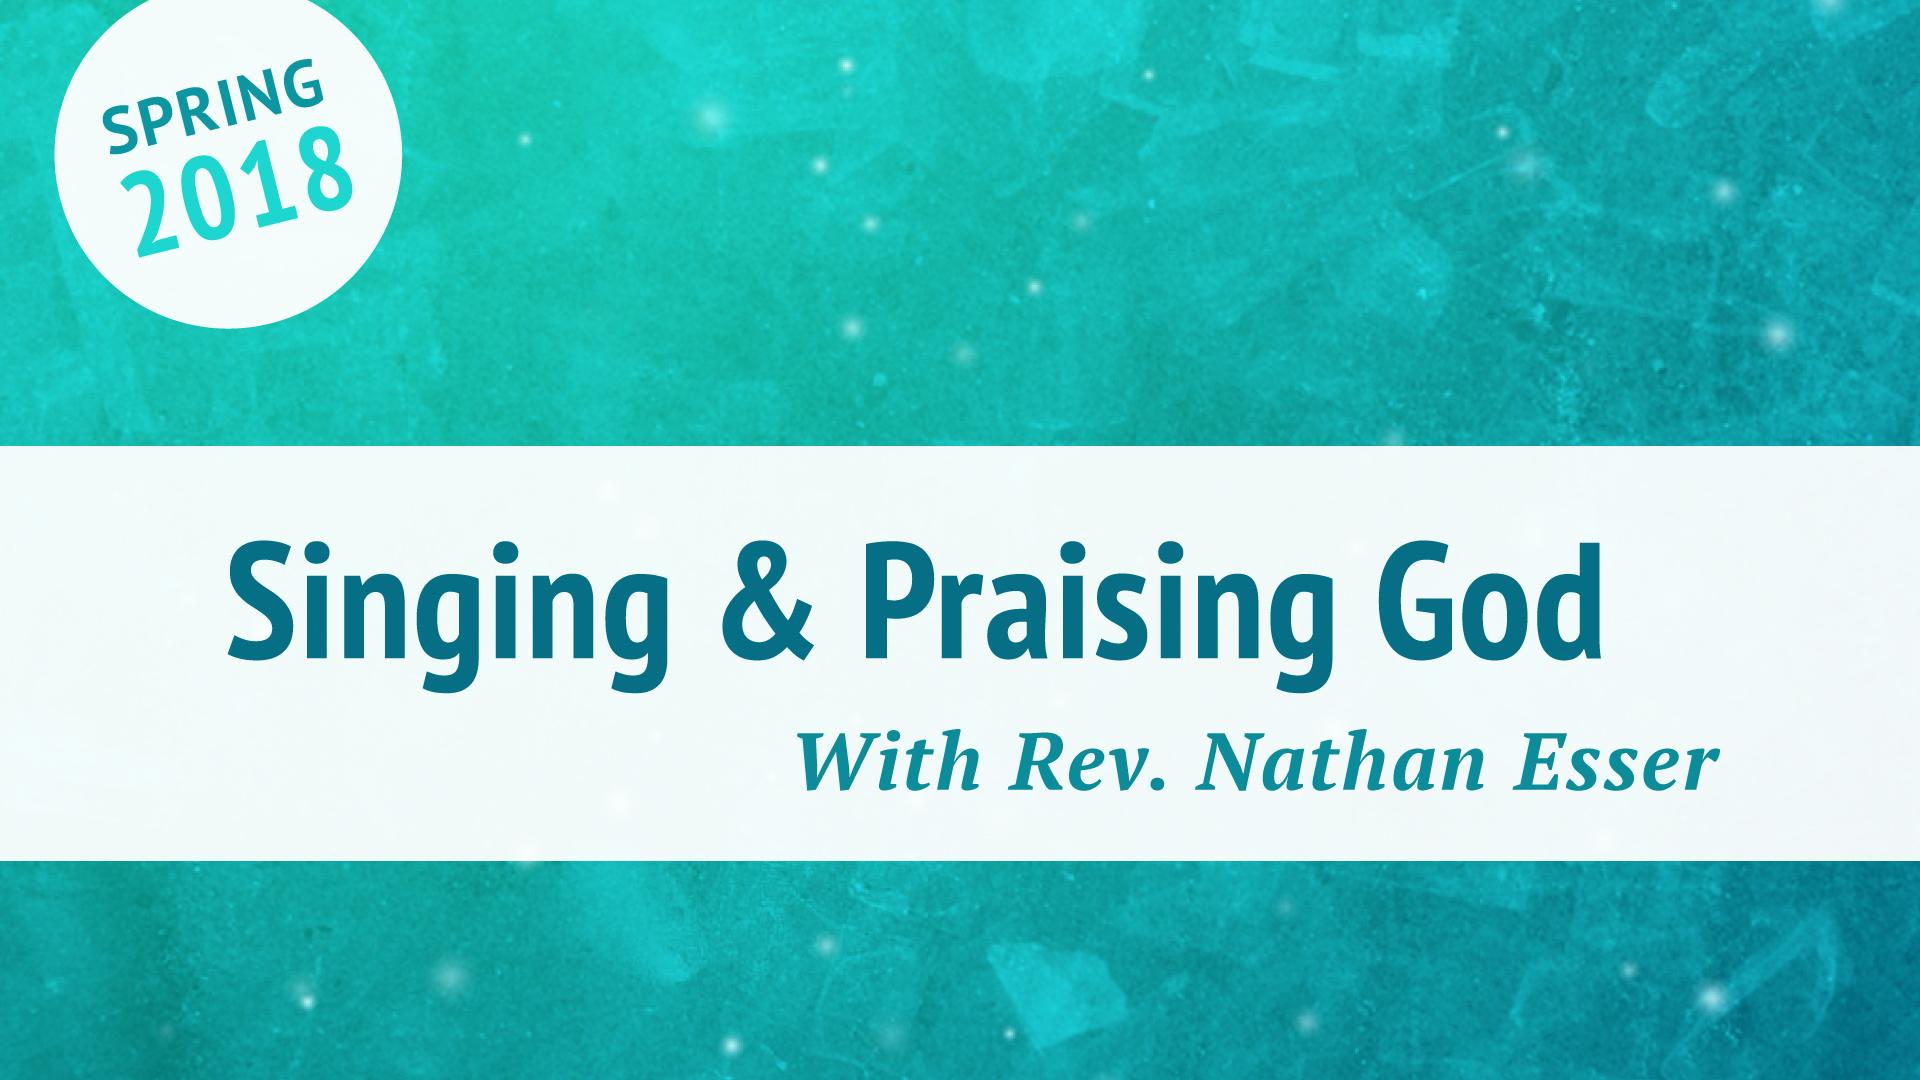 Singing and Praising God